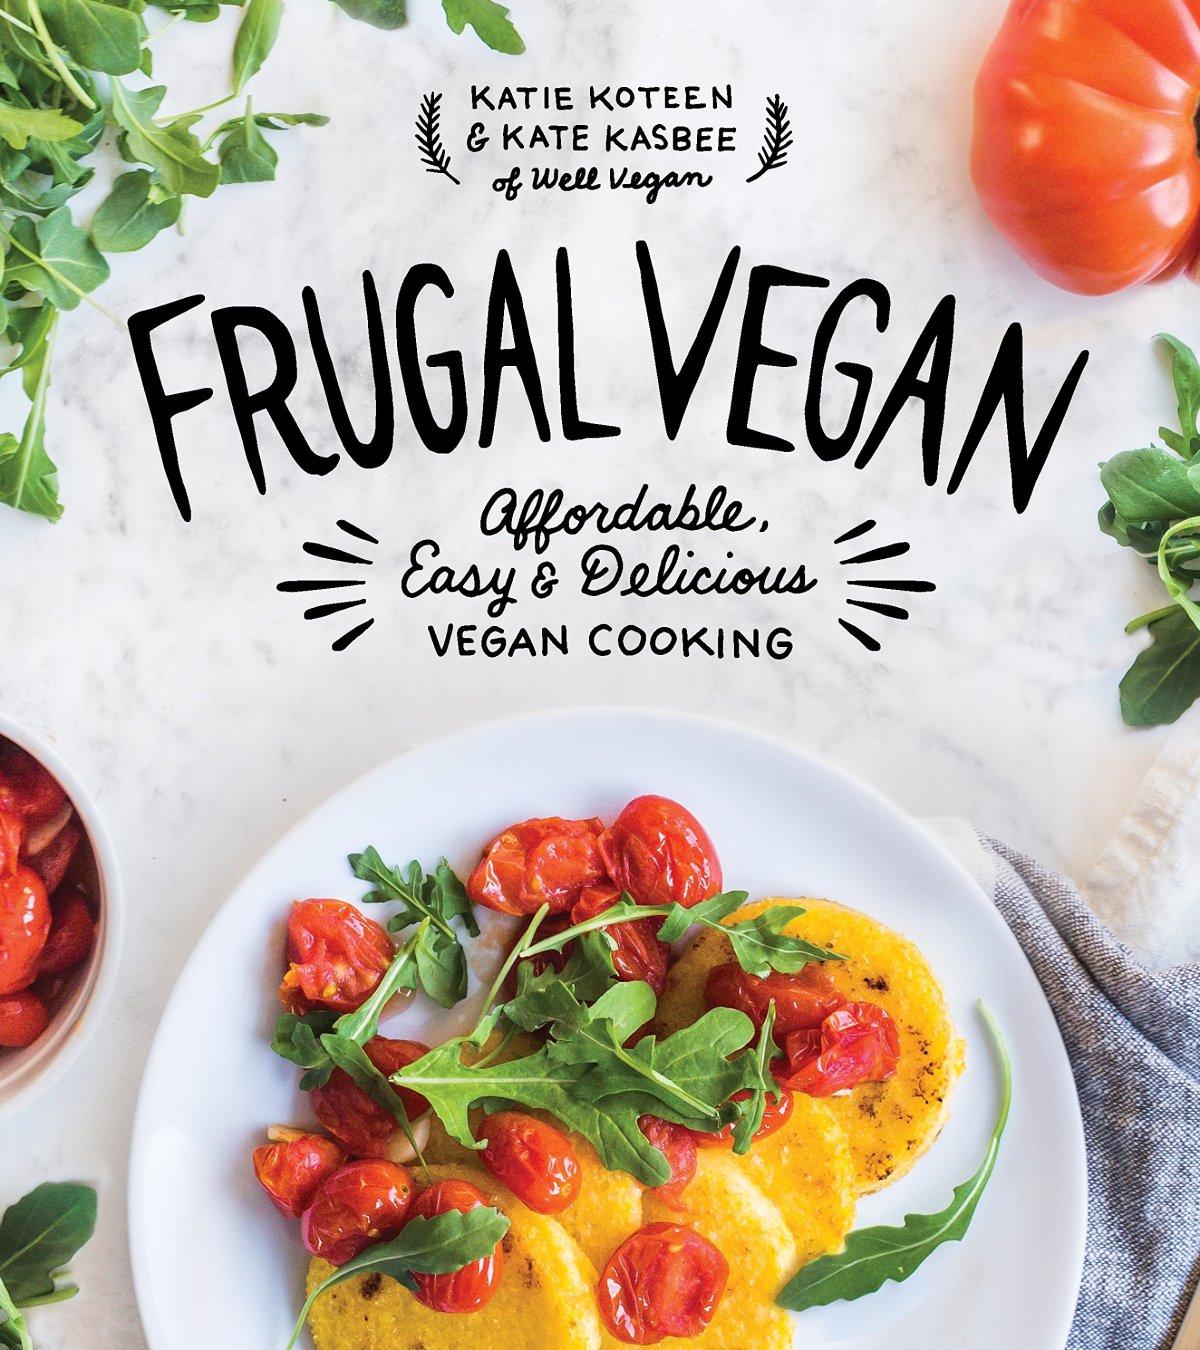 Frugal Vegan Cookbook